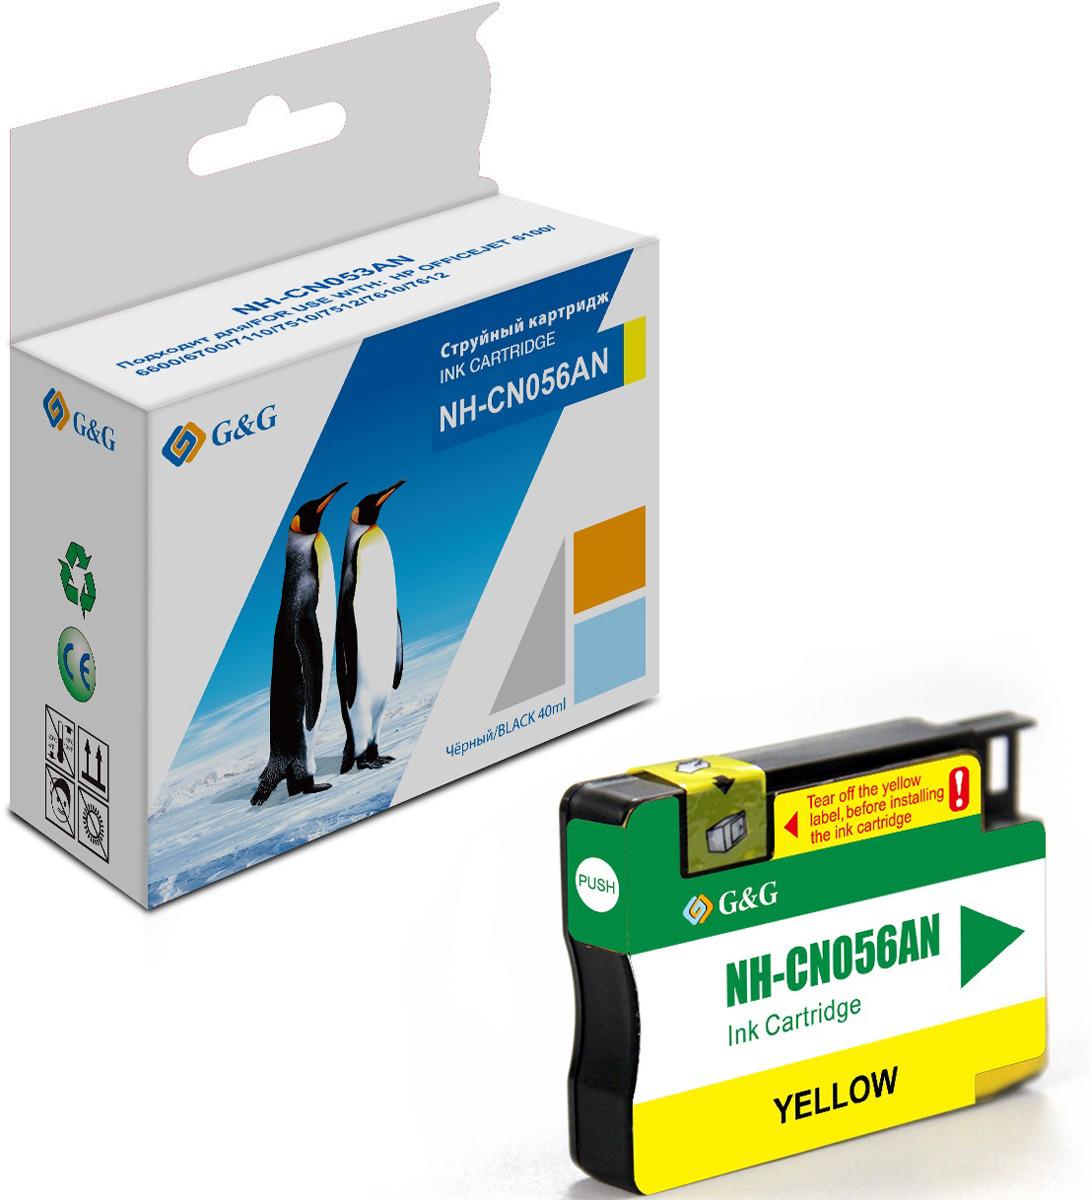 Картридж G&G NH-CN056AN 933XL для HP OJ Pro 6100/6600/6700/7110/7510/7610/7612 (14 ml), желтый printer 7110 hp